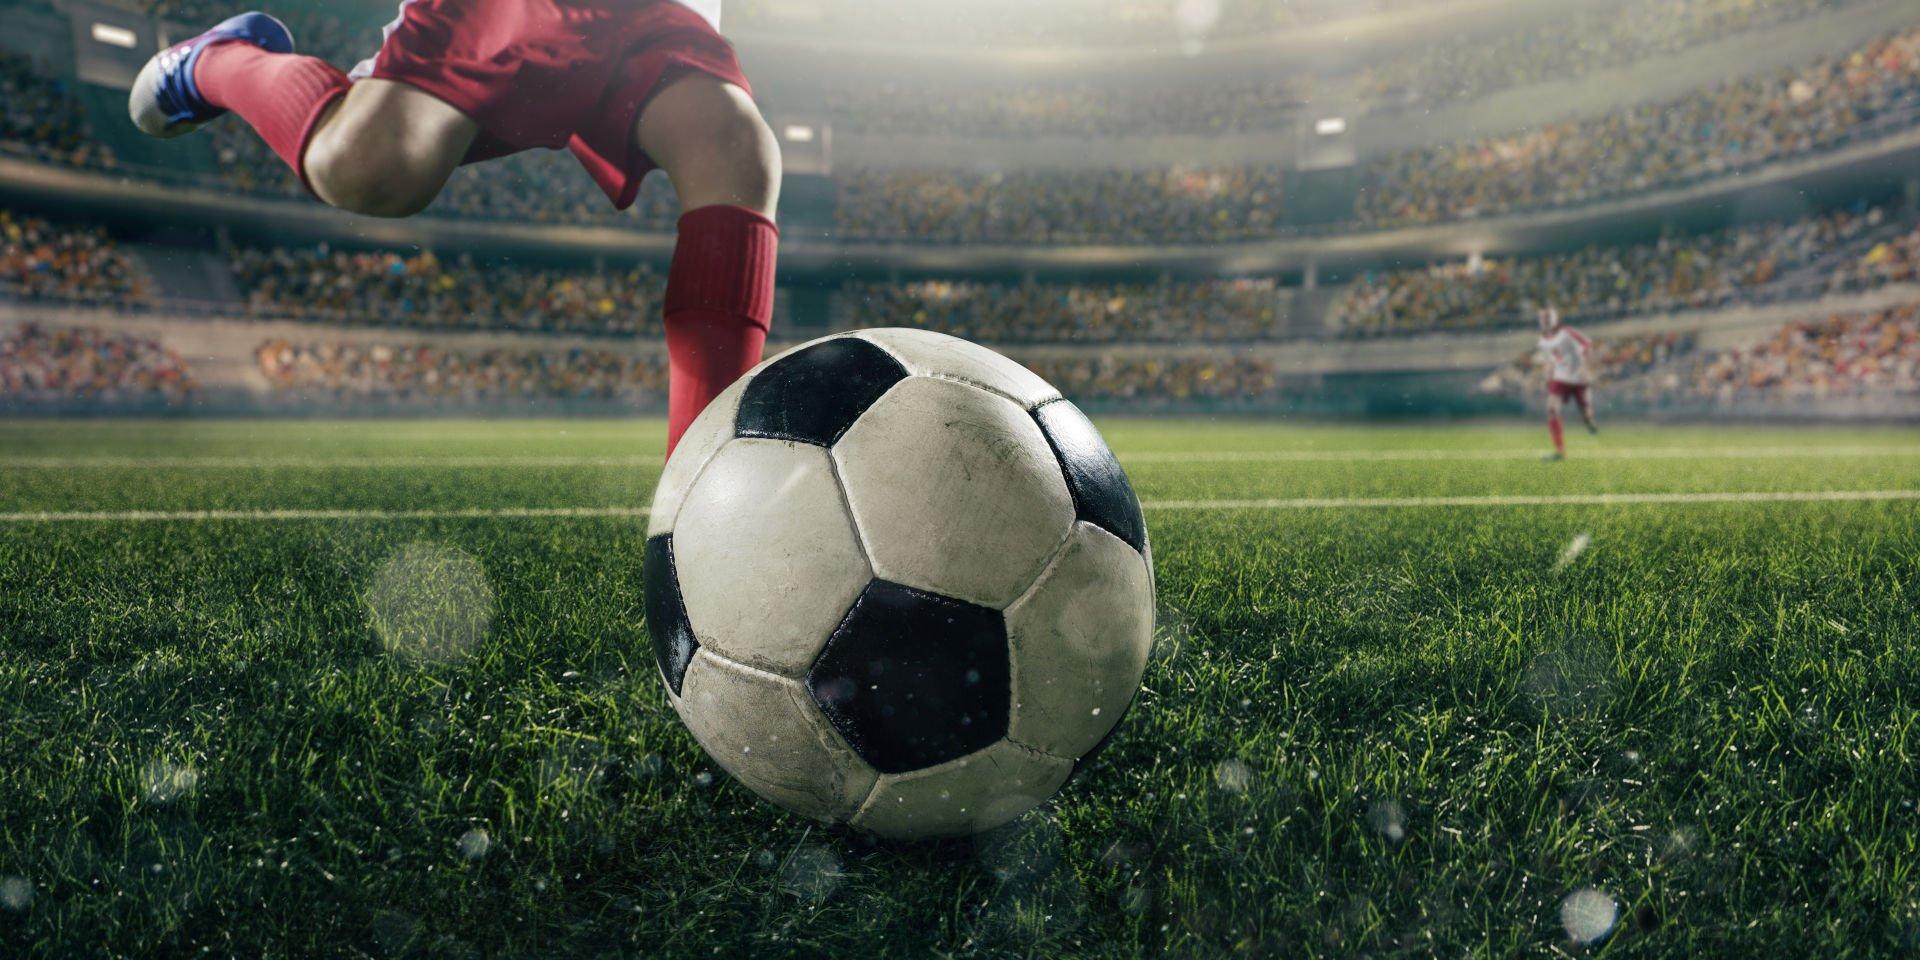 kicking-off-ball